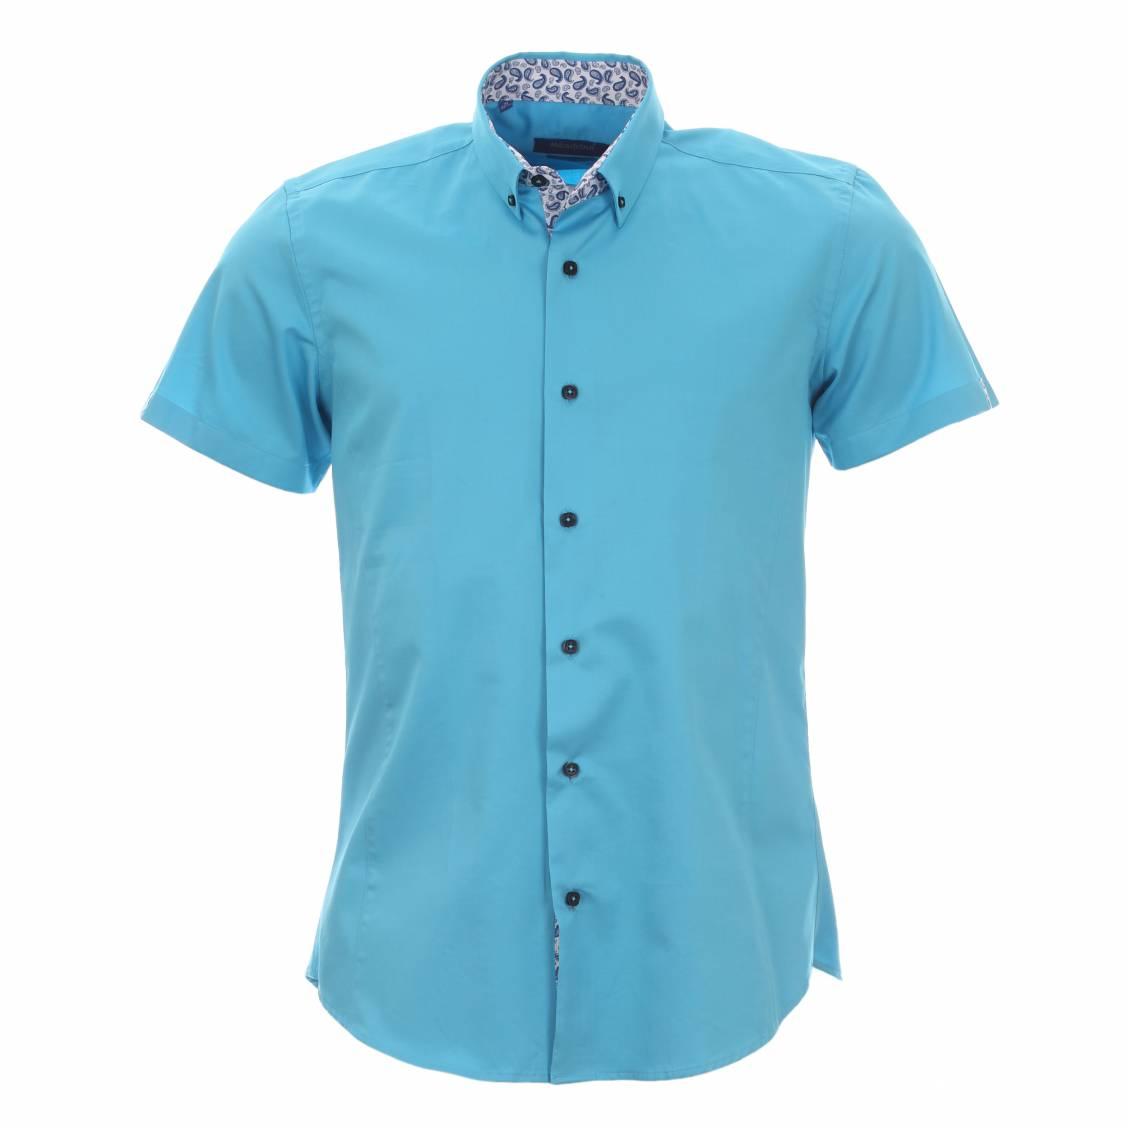 Chemise femme manche courte turquoise